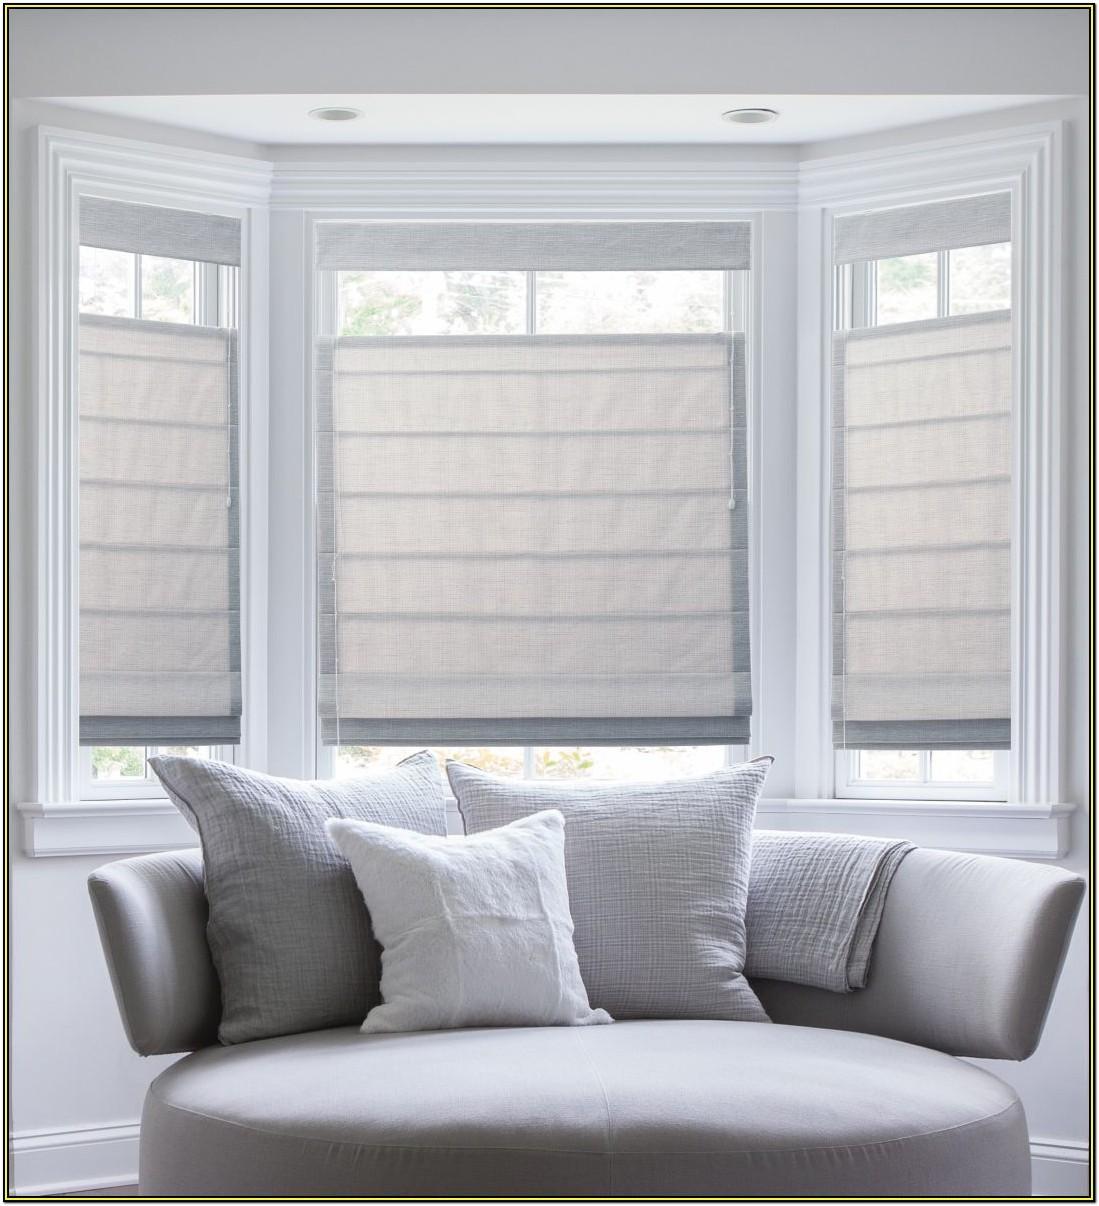 Windows Best Type Of Blinds For Living Room